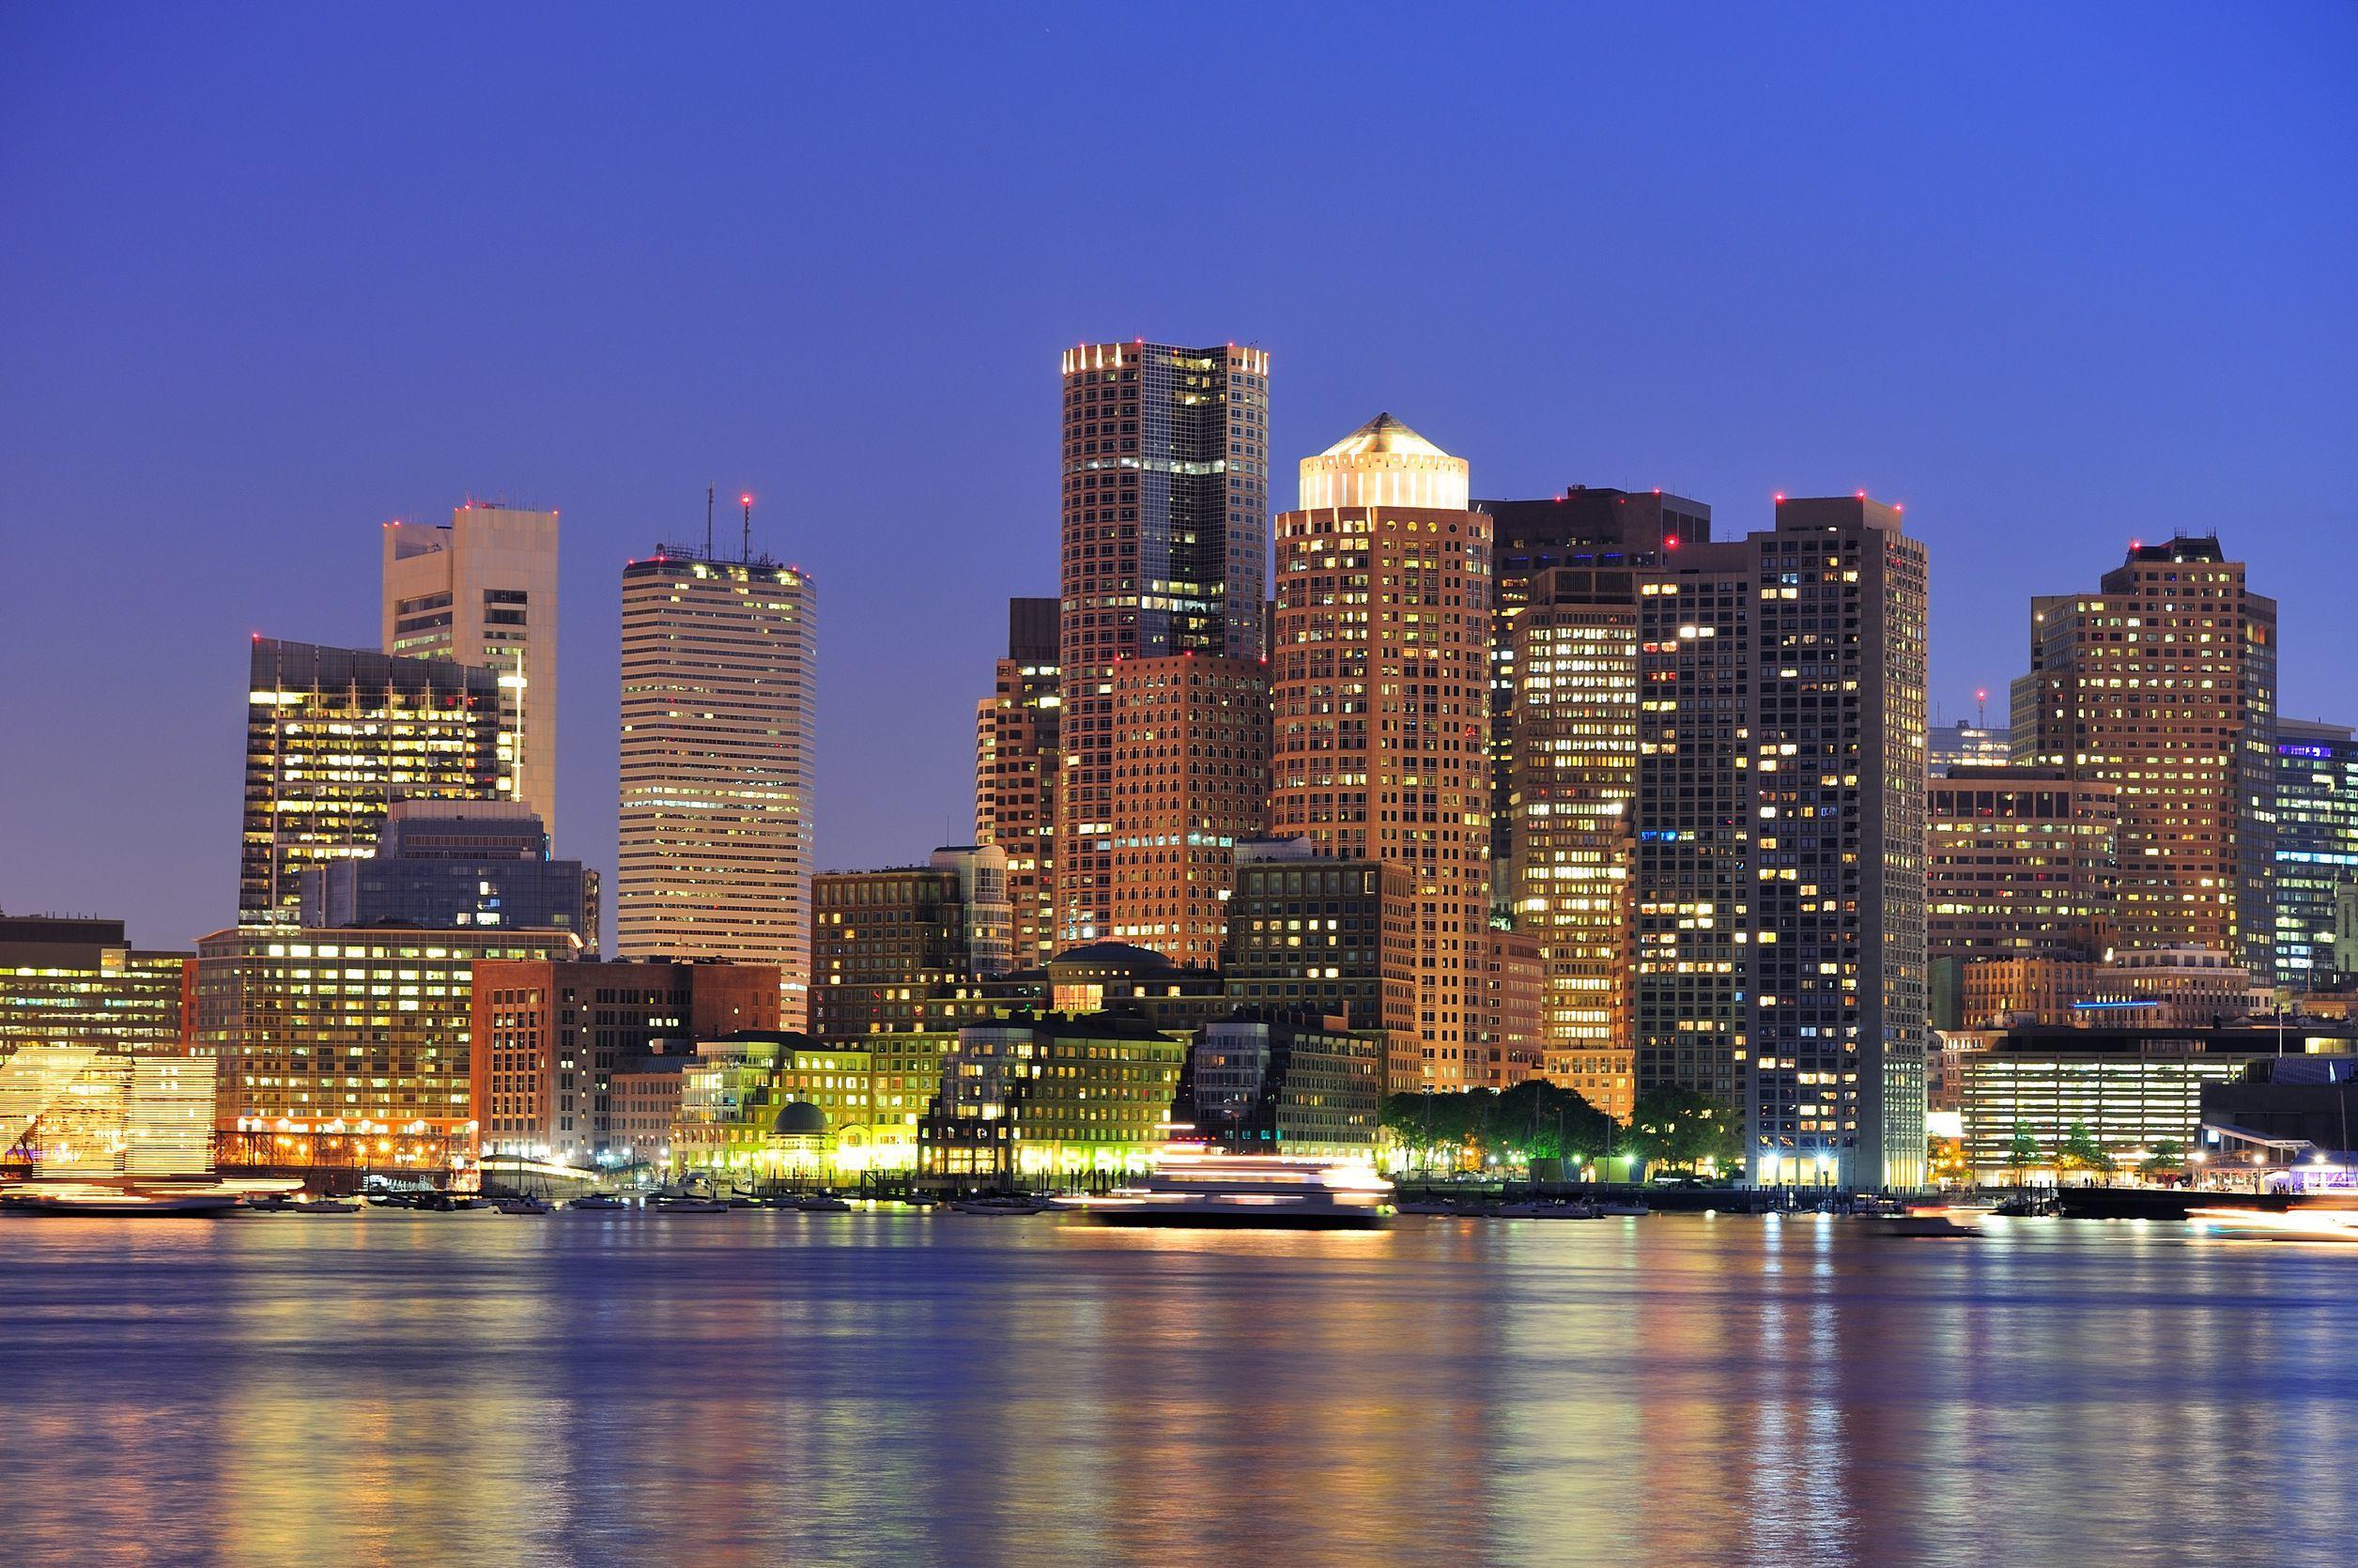 SIRION Biotech plans new office in Boston region